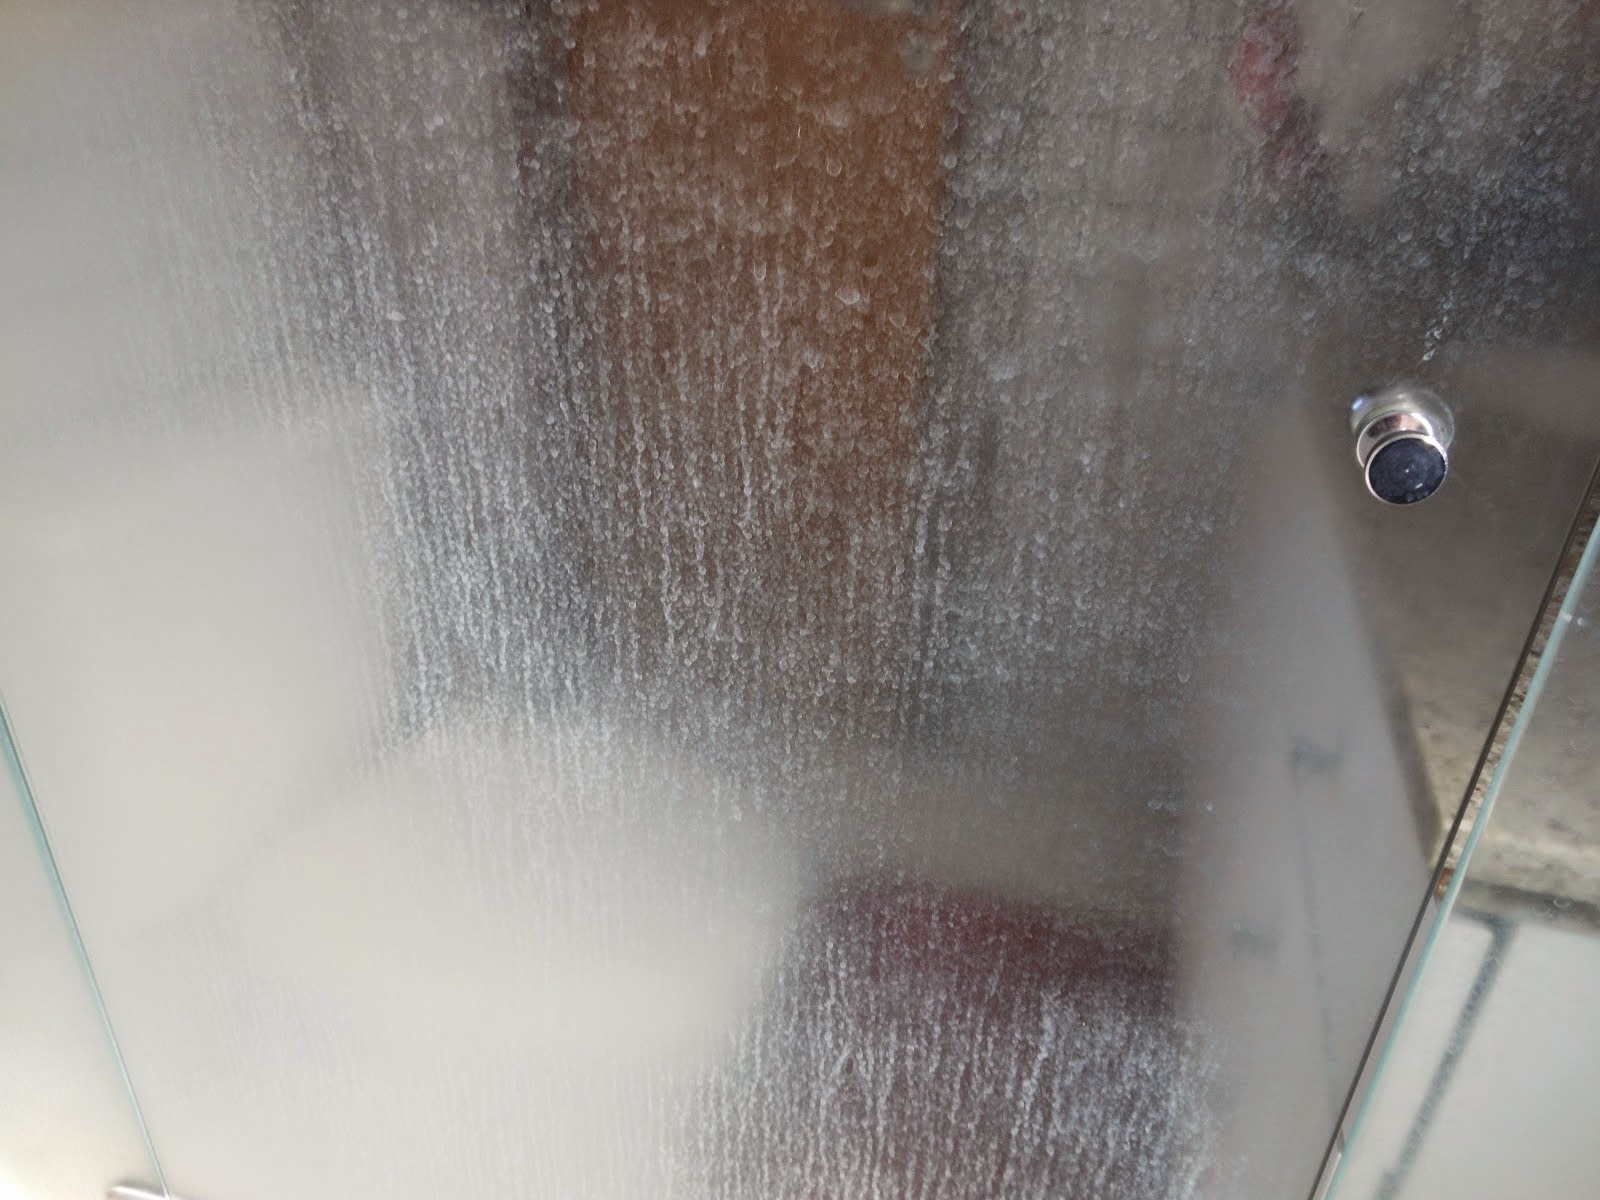 #5F4D44 Como limpara box de vidro como limpar box de vidro para banheiro 1496 Tirar Mancha Janela De Aluminio